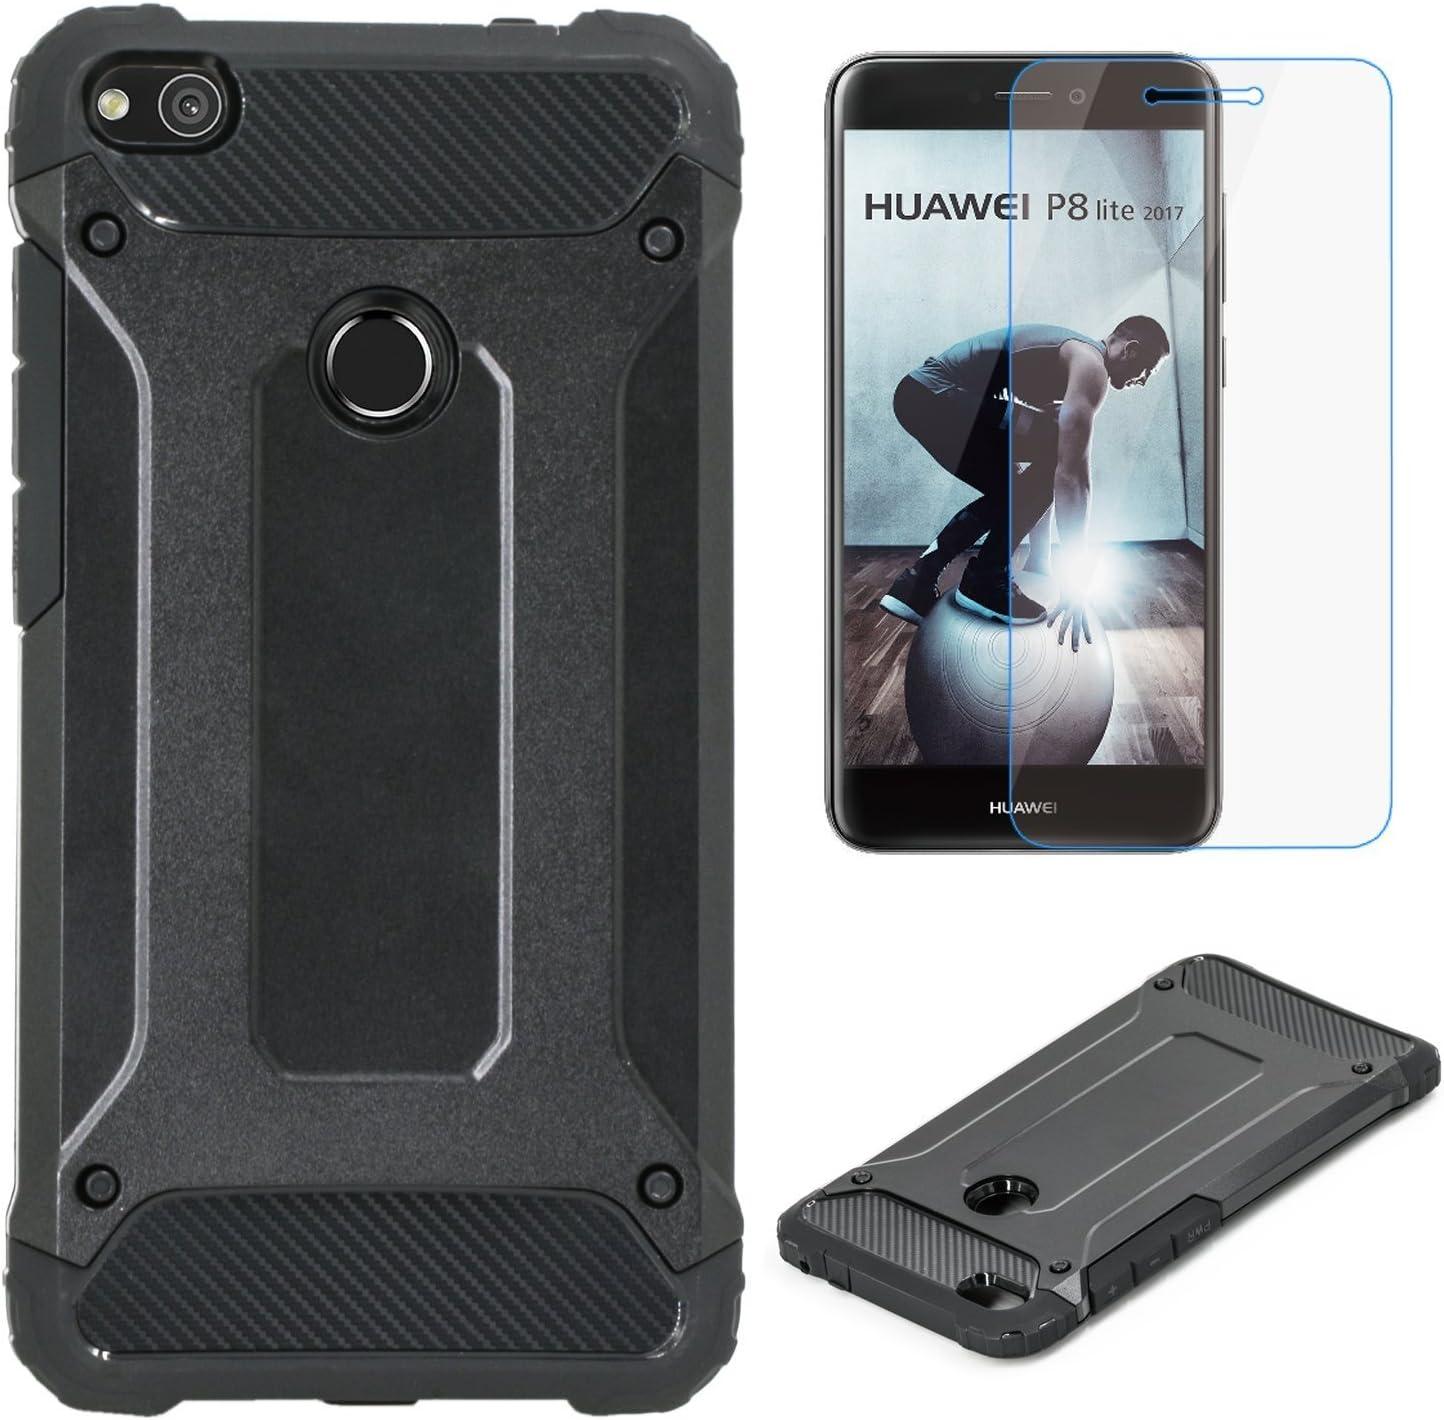 Electro-weideworld Huawei P8 Lite 2017 Funda, [Pesada] [Doble Capa] Carcasa de Protección Hibrida Armadura Funda para Huawei P8 Lite 2017 + 1 x Protector de Pantalla: Amazon.es: Electrónica